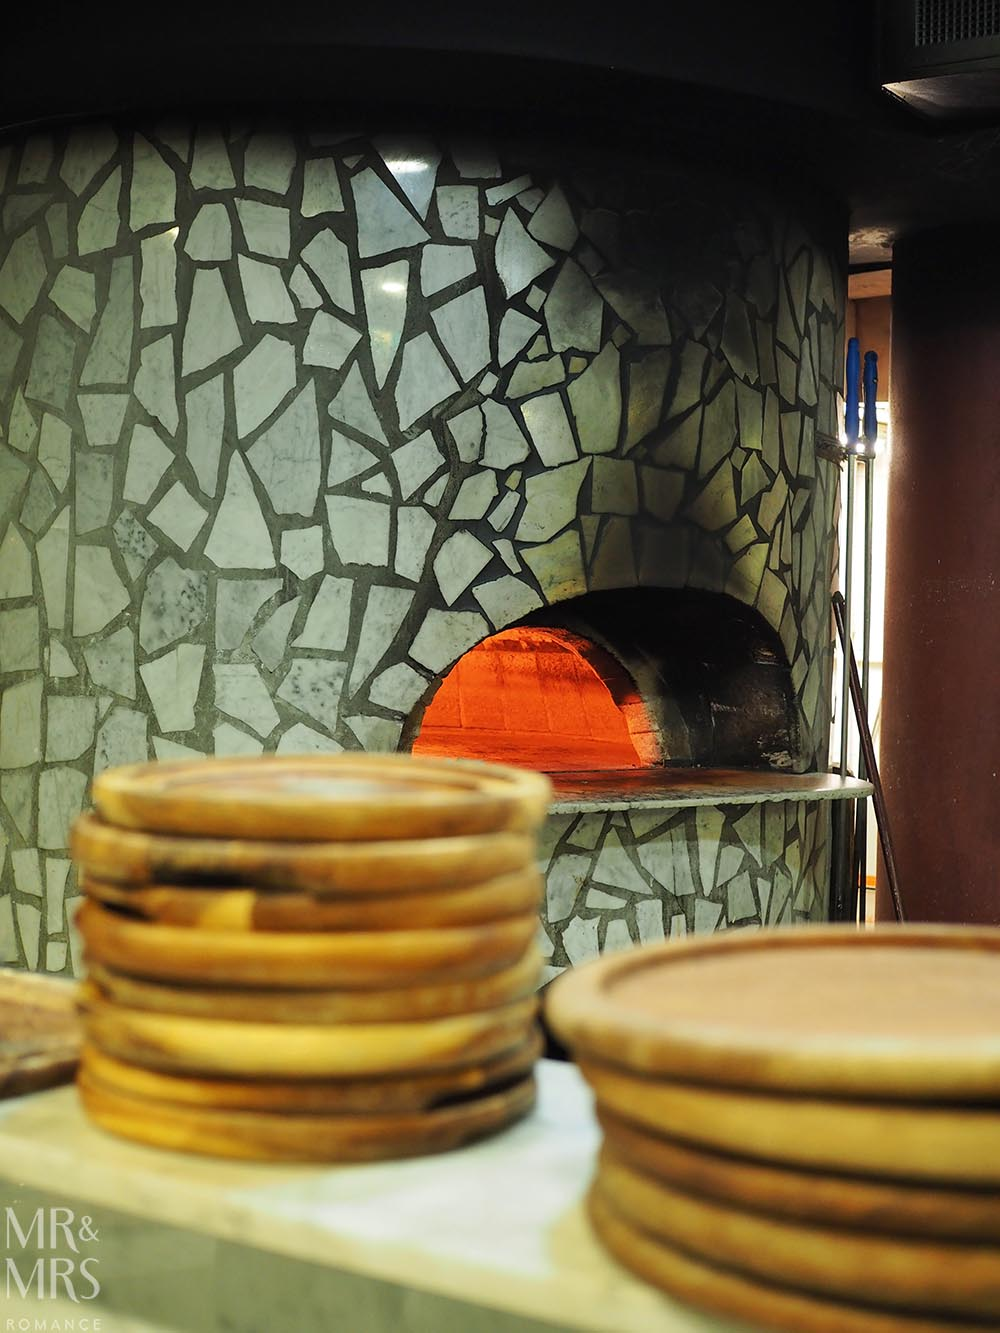 Lucio Pizzeria Sydney - pizza oven